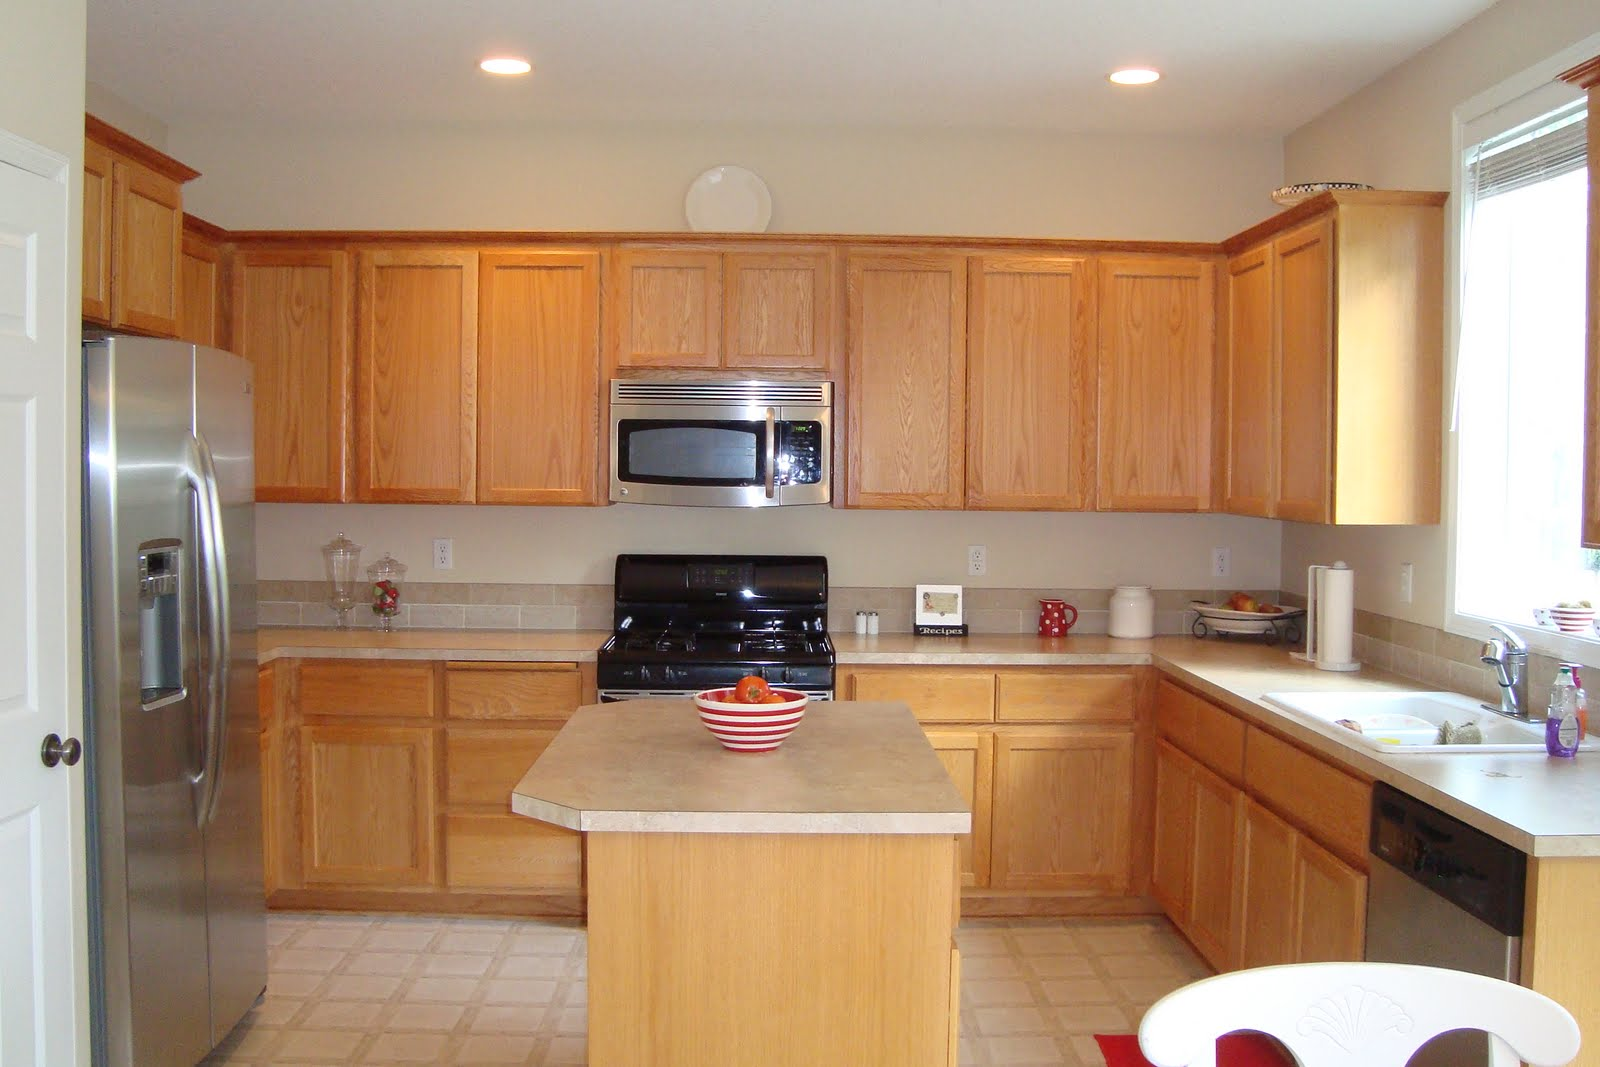 Fantastic kitchen pantry cabinet design audreycouture for Fantastic kitchen designs